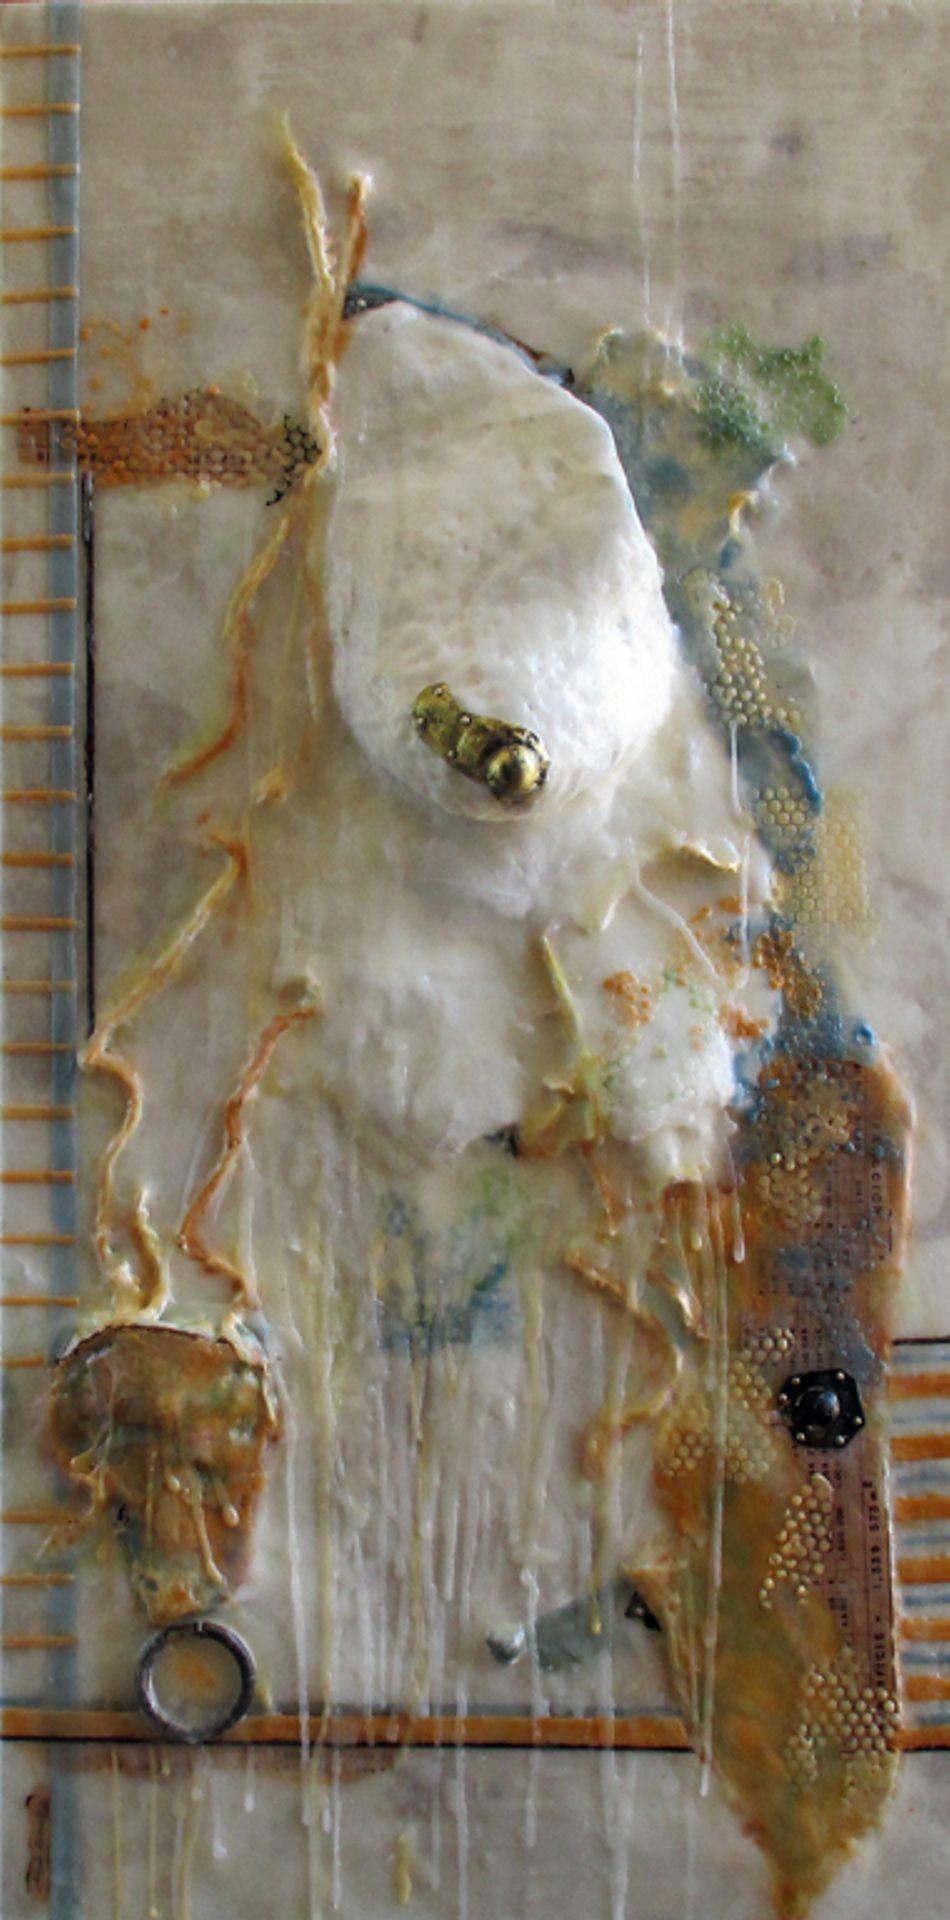 Bees wax, plaster, fabric and metal on wood. angelagonzalezrangel@gmail.com Atelier 109 Tijuana, México